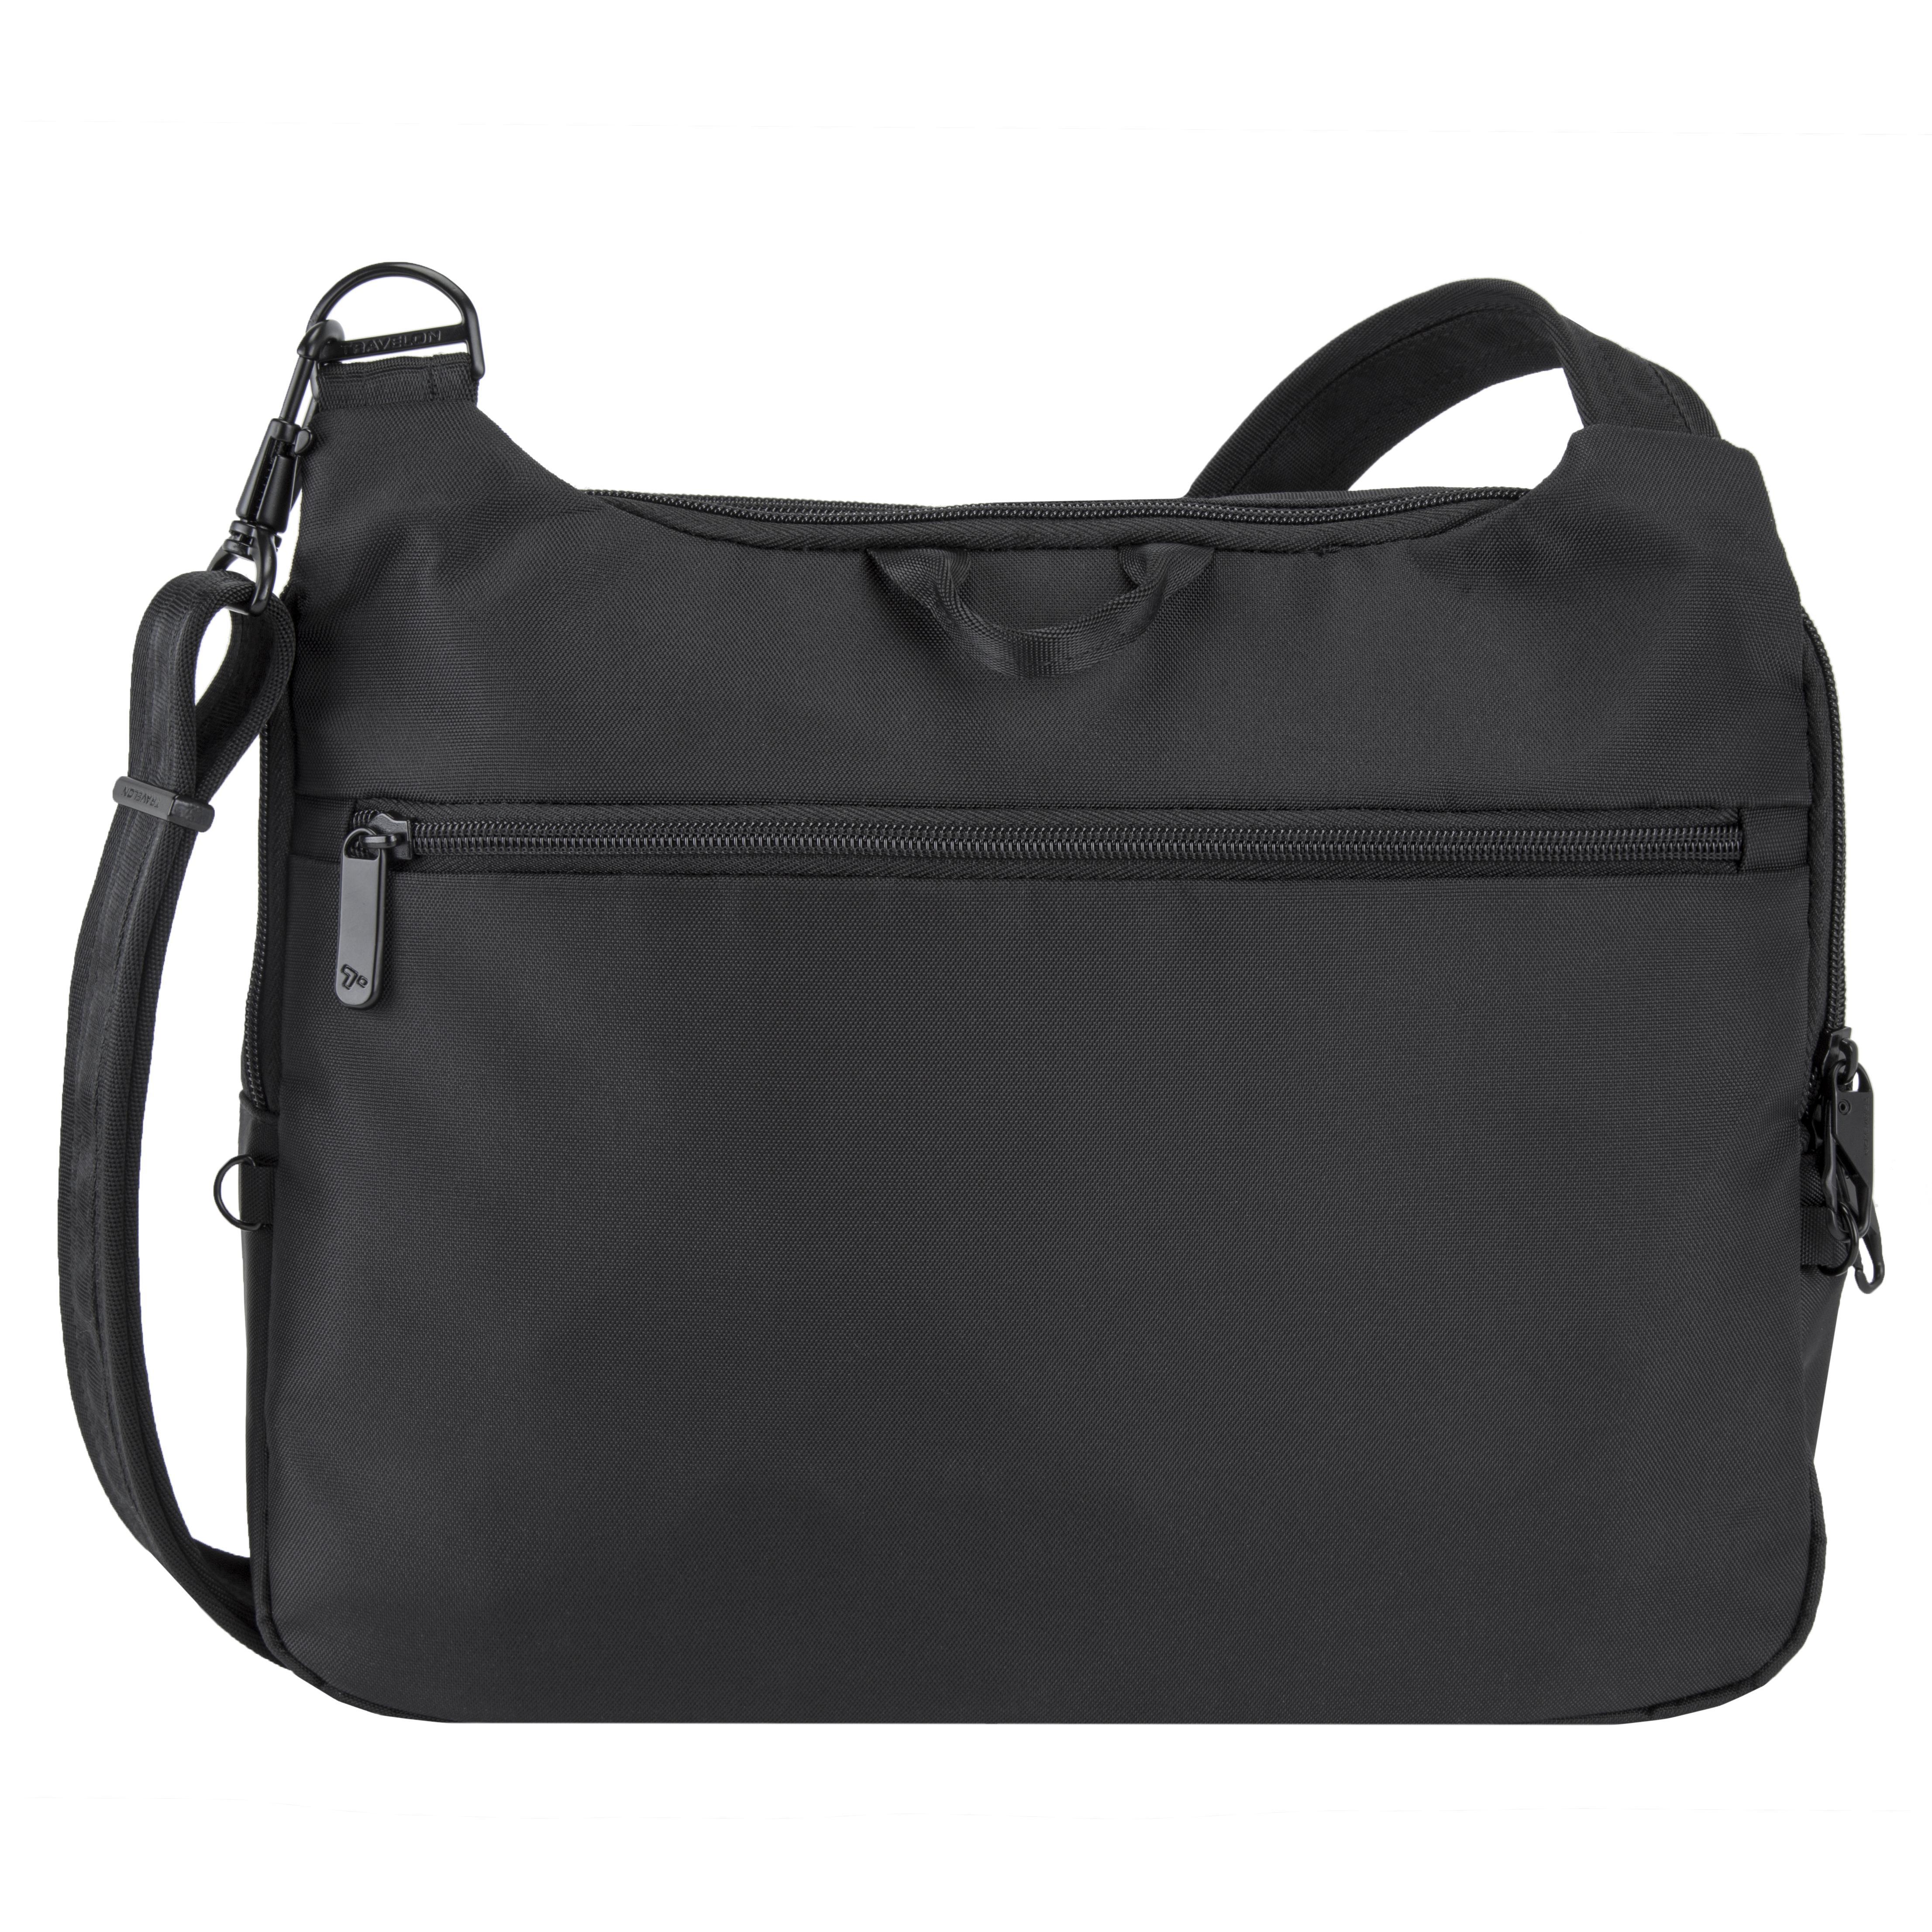 New-Travelon-Men-039-s-Anti-Theft-Urban-E-W-Tablet-Messenger-Bag thumbnail 3